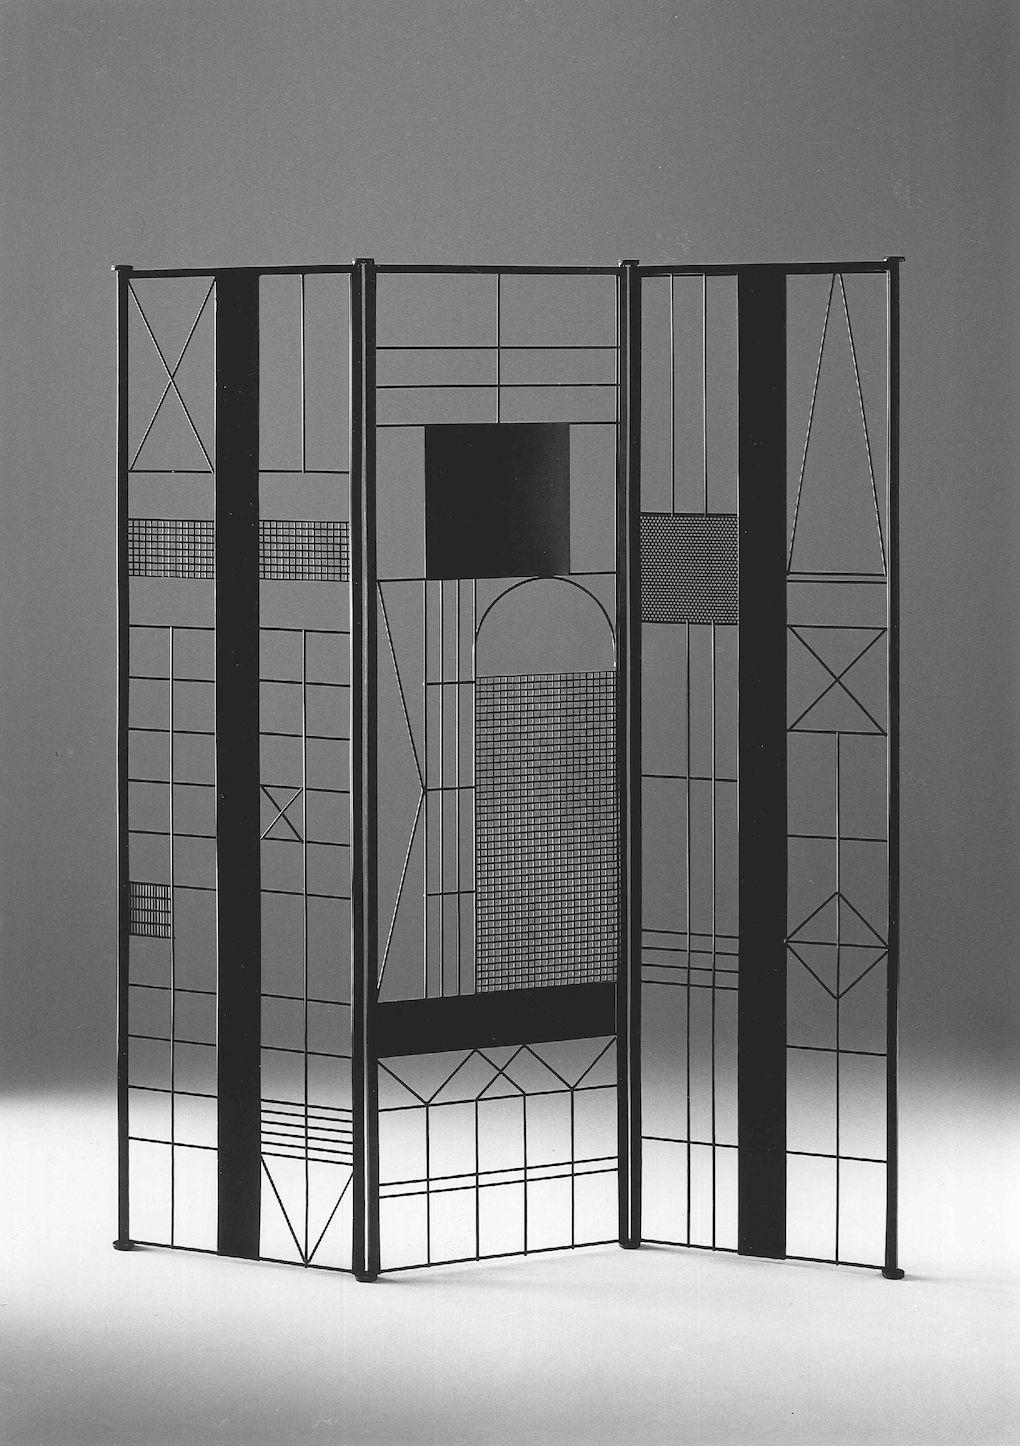 Paravento design by bruno munari china spaces pinterest